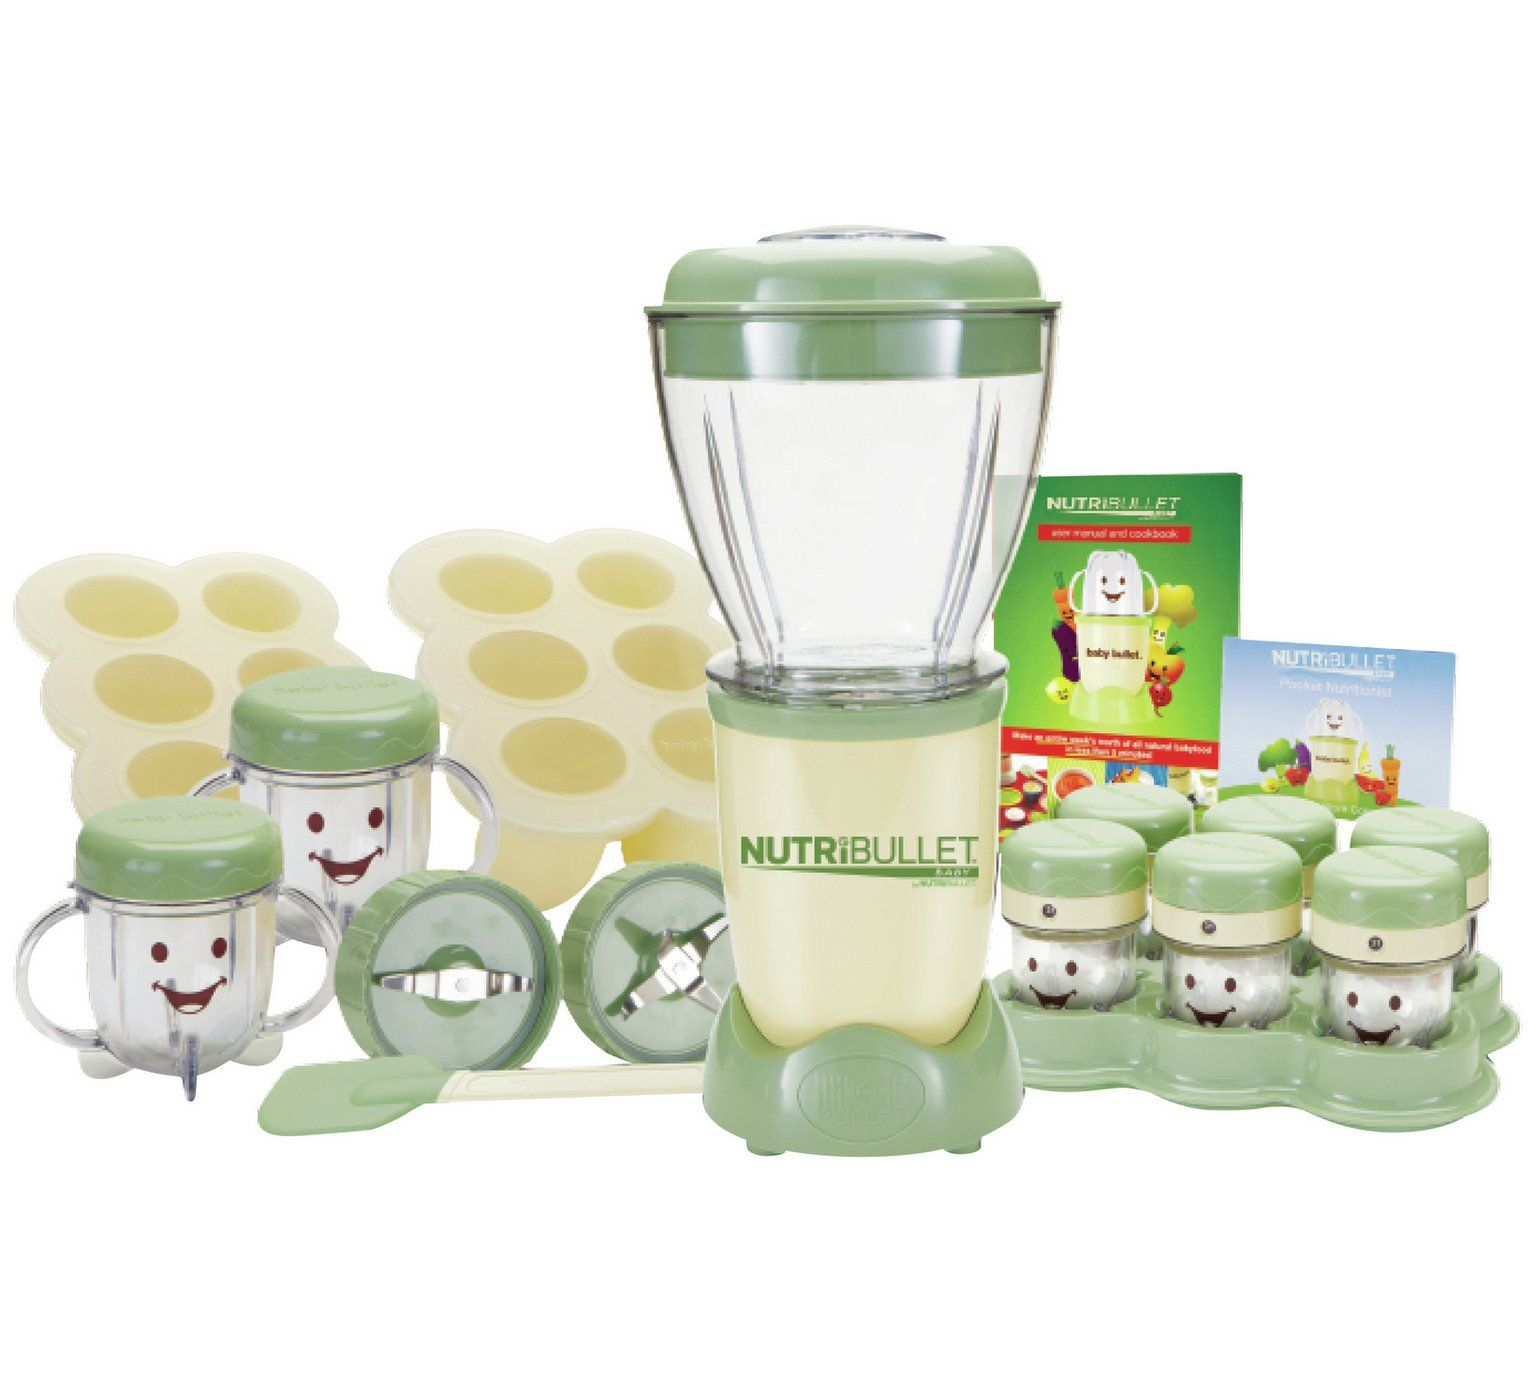 Buy NutriBullet Baby Food Processor at Argos.co.uk, visit